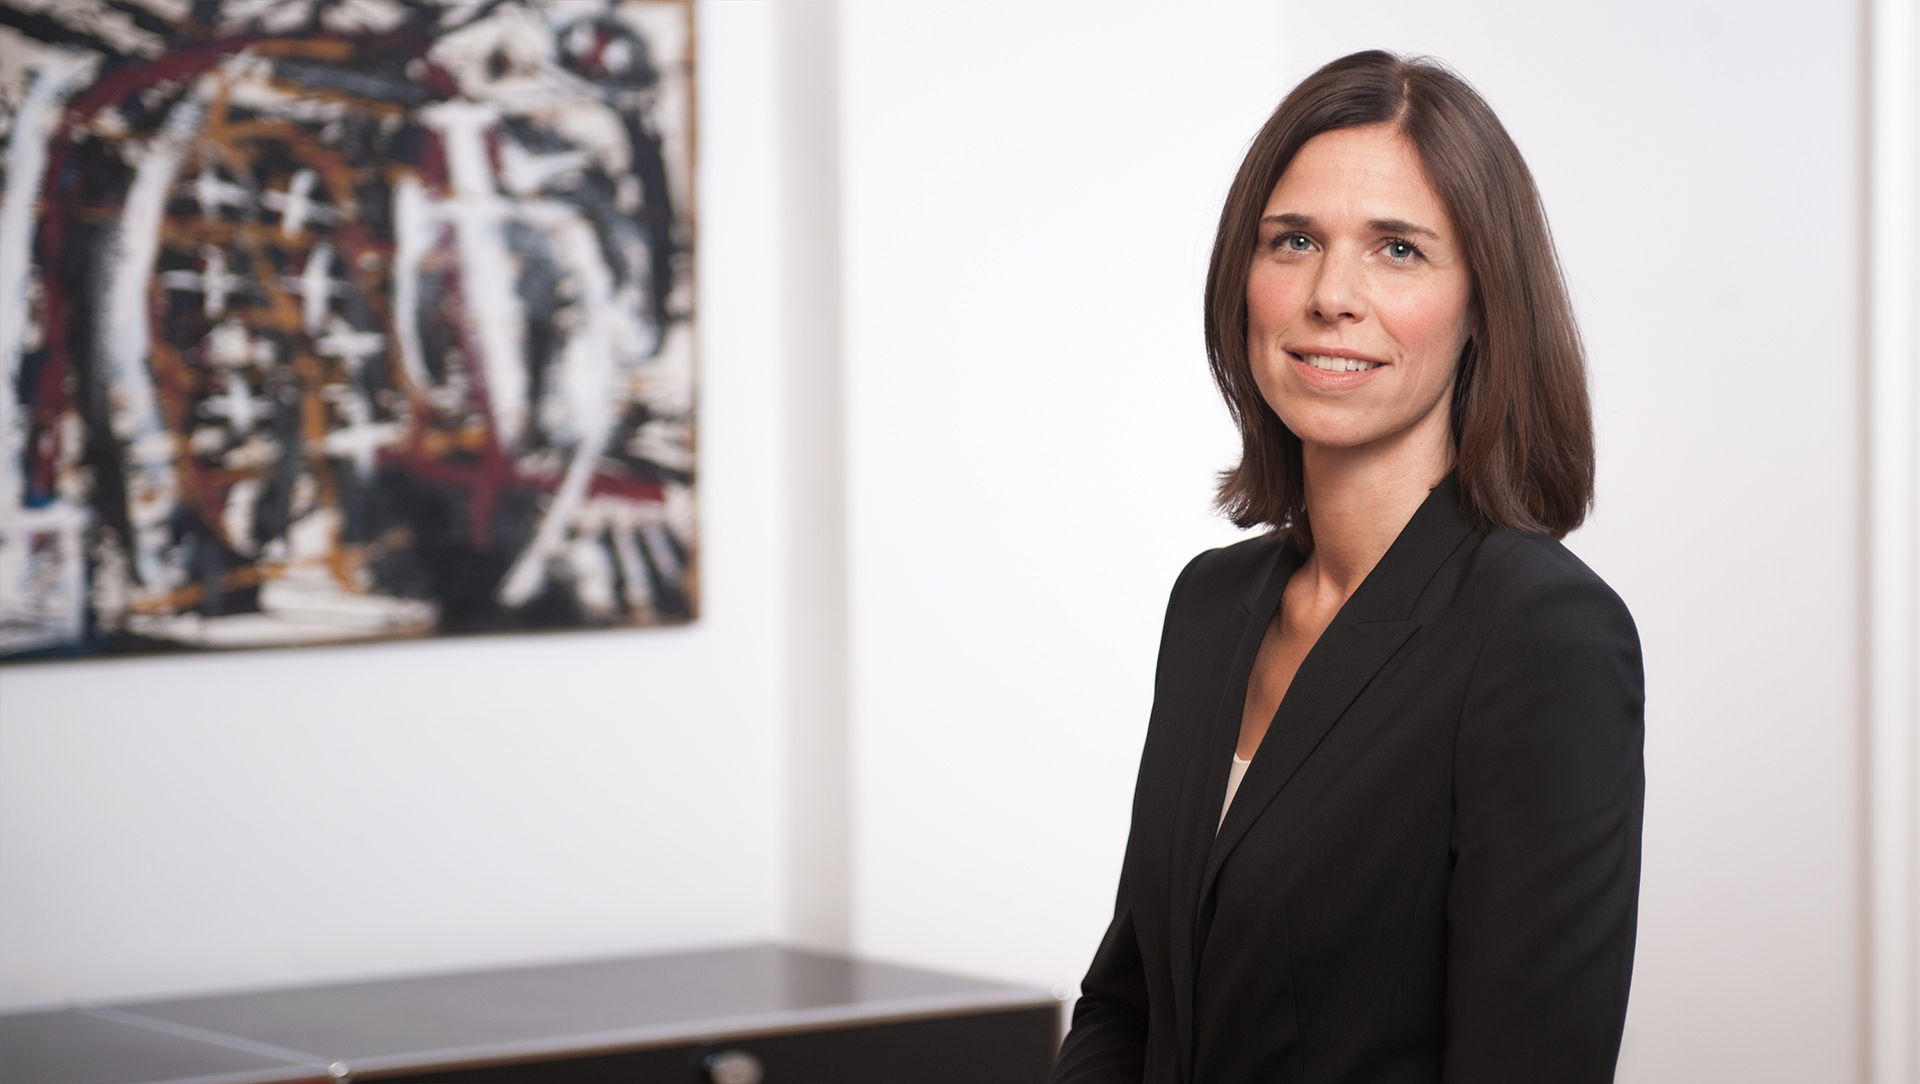 Unger Rechtsanwälte - Rechtsanwältin Carolin Lütcke